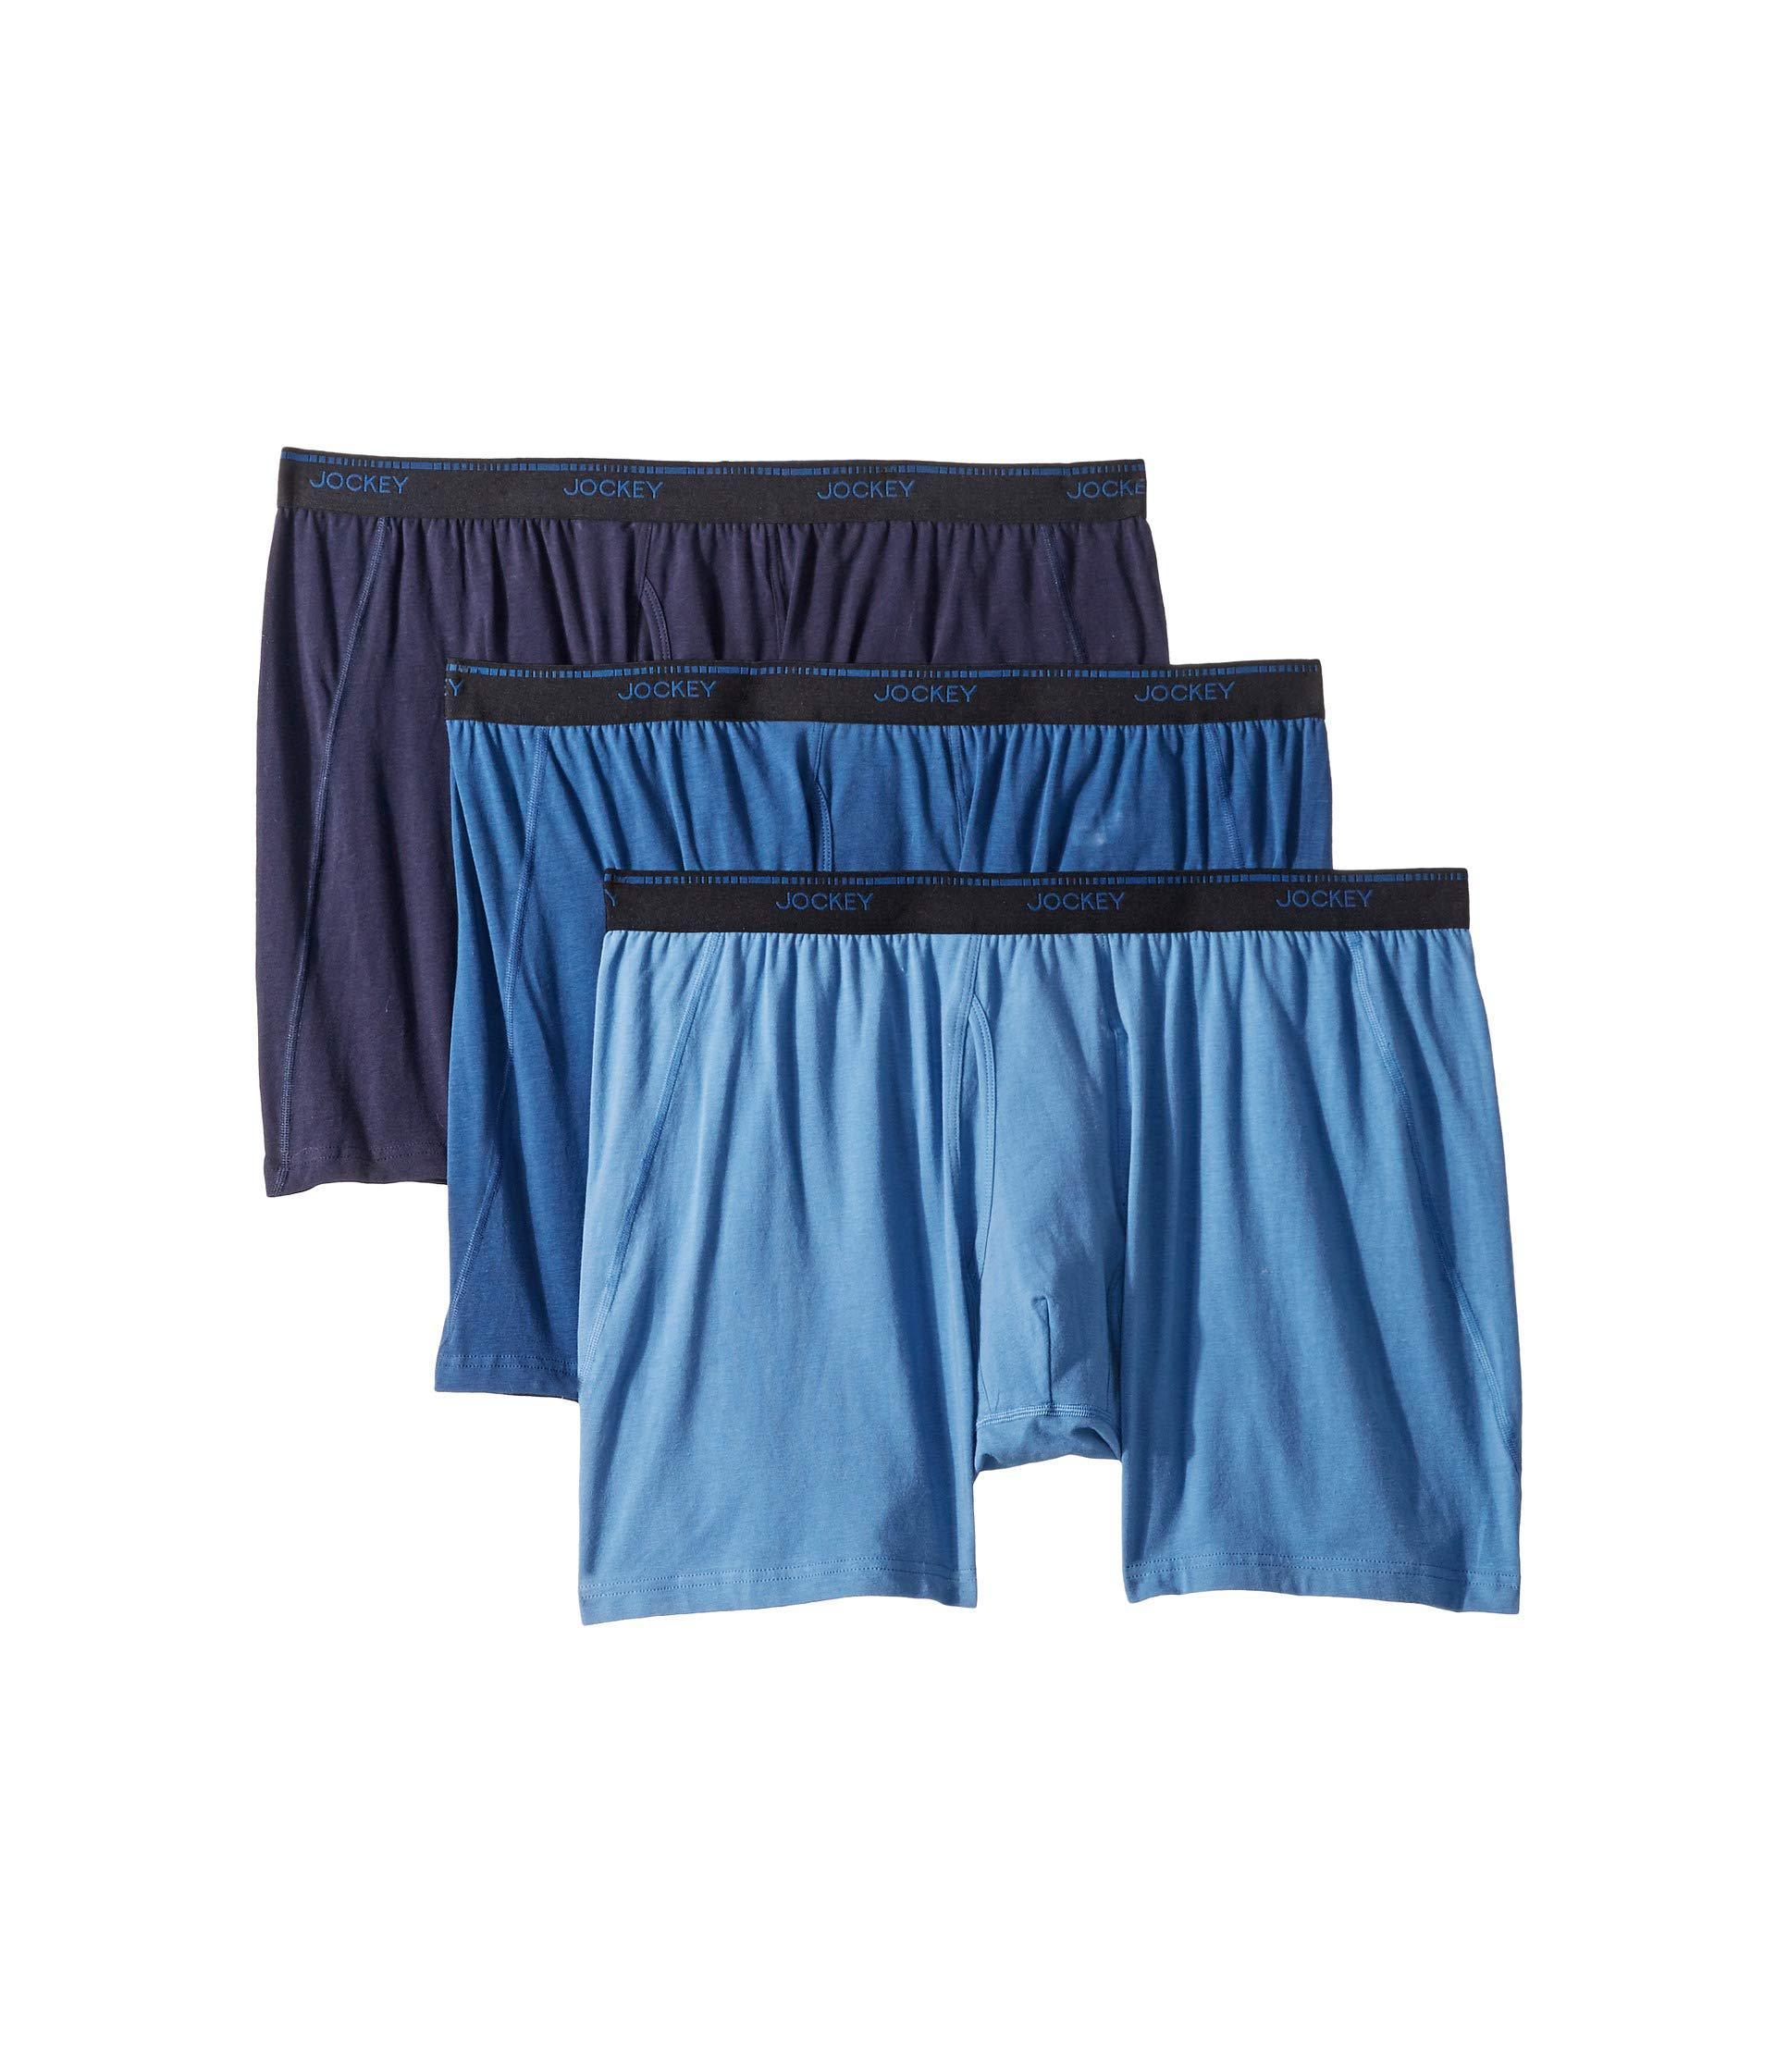 40afd62a3dea Jockey - Blue Essential Fit Max Stretch Midway Brief 3-pack (black) Men's.  View fullscreen